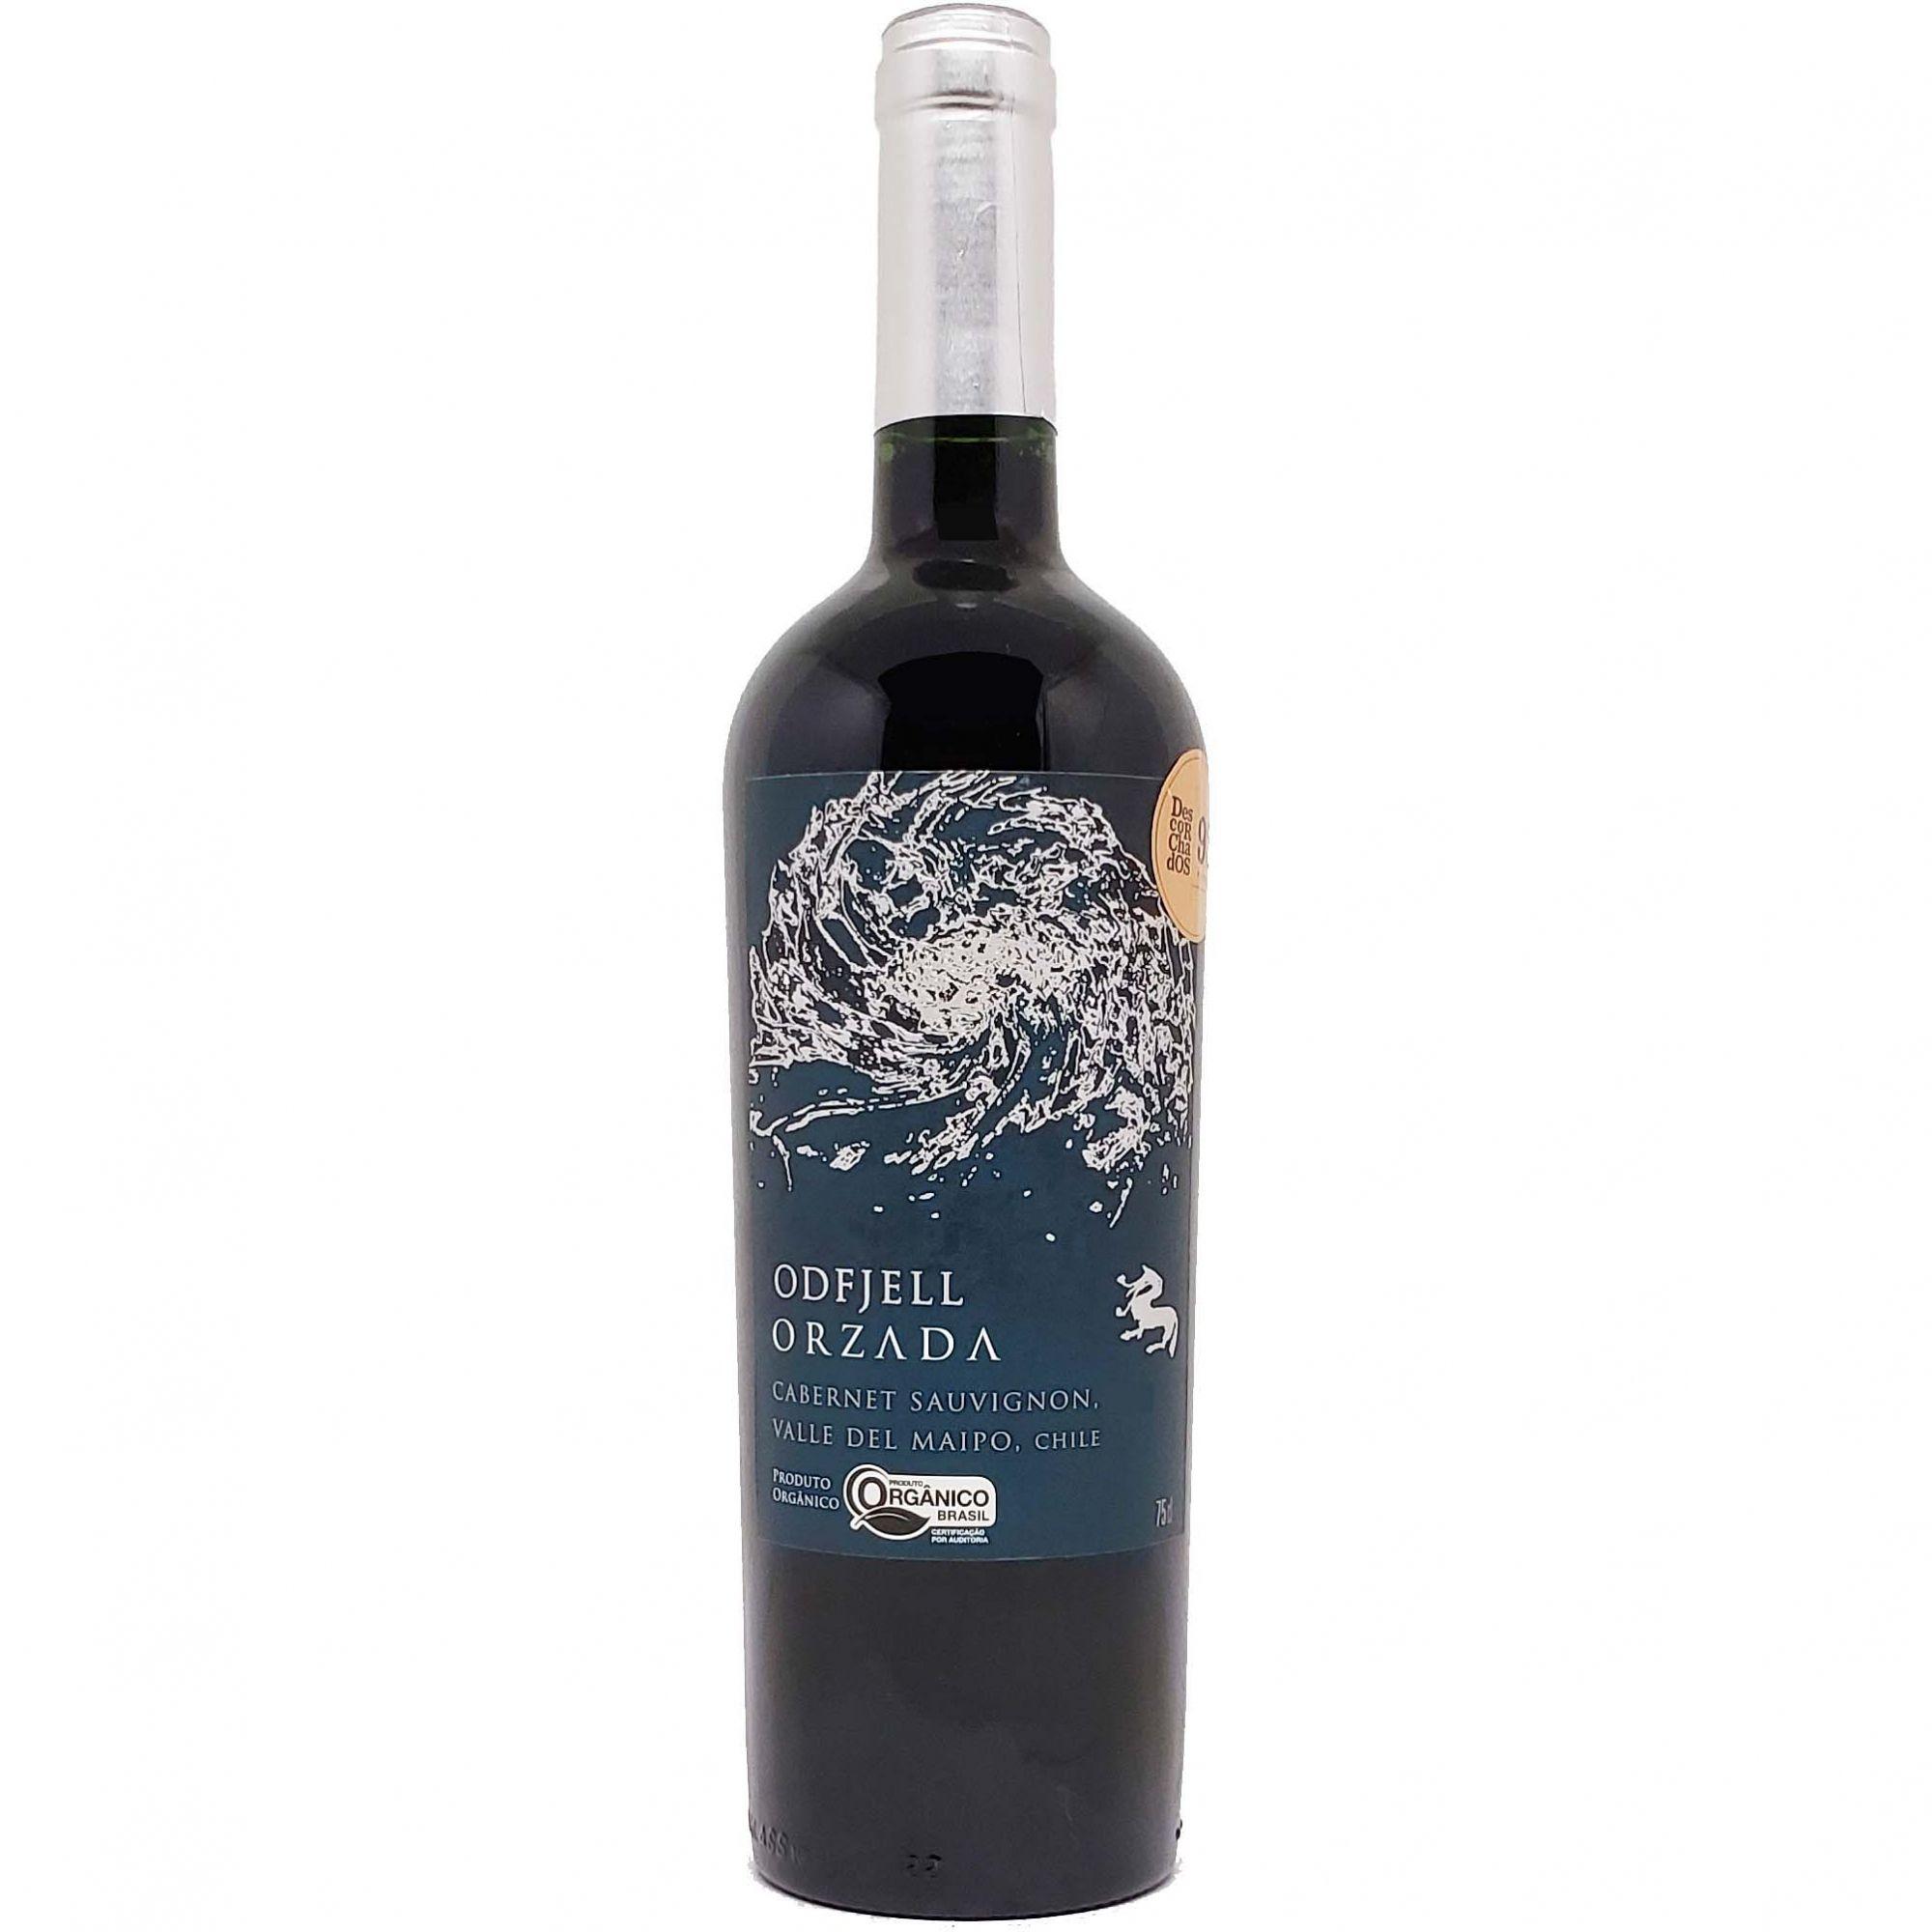 Vinho Tinto Odfjell Orzada Cabernet Sauvignon - 750ml -